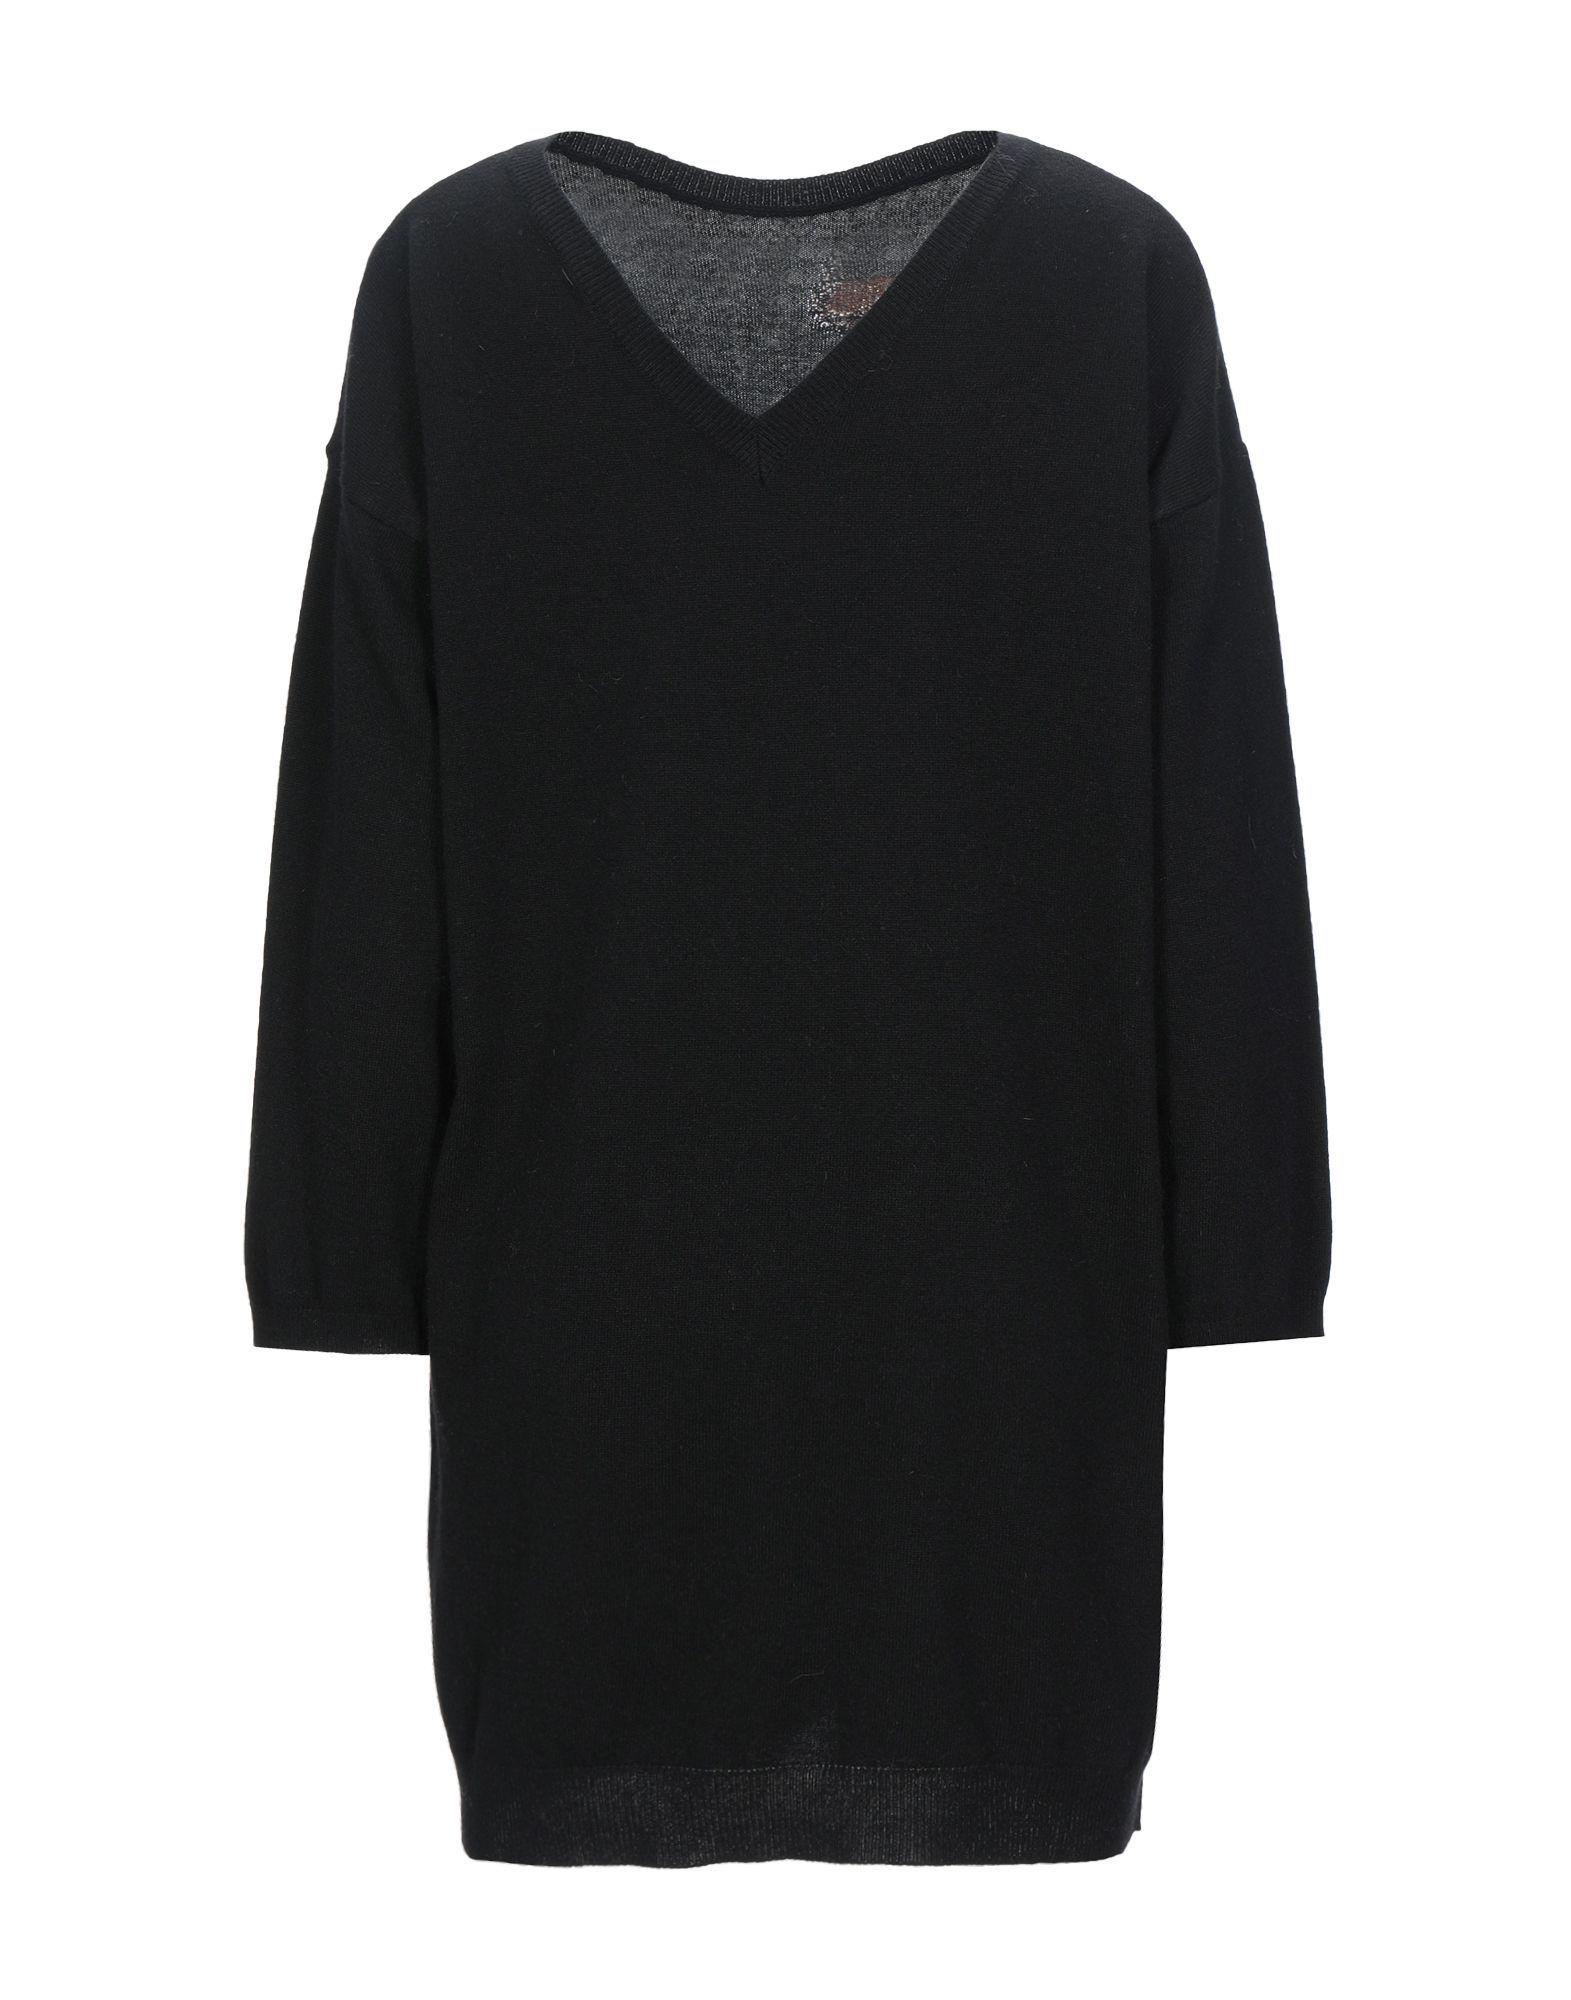 Kaos Jeans Black Lame Knit Jumper